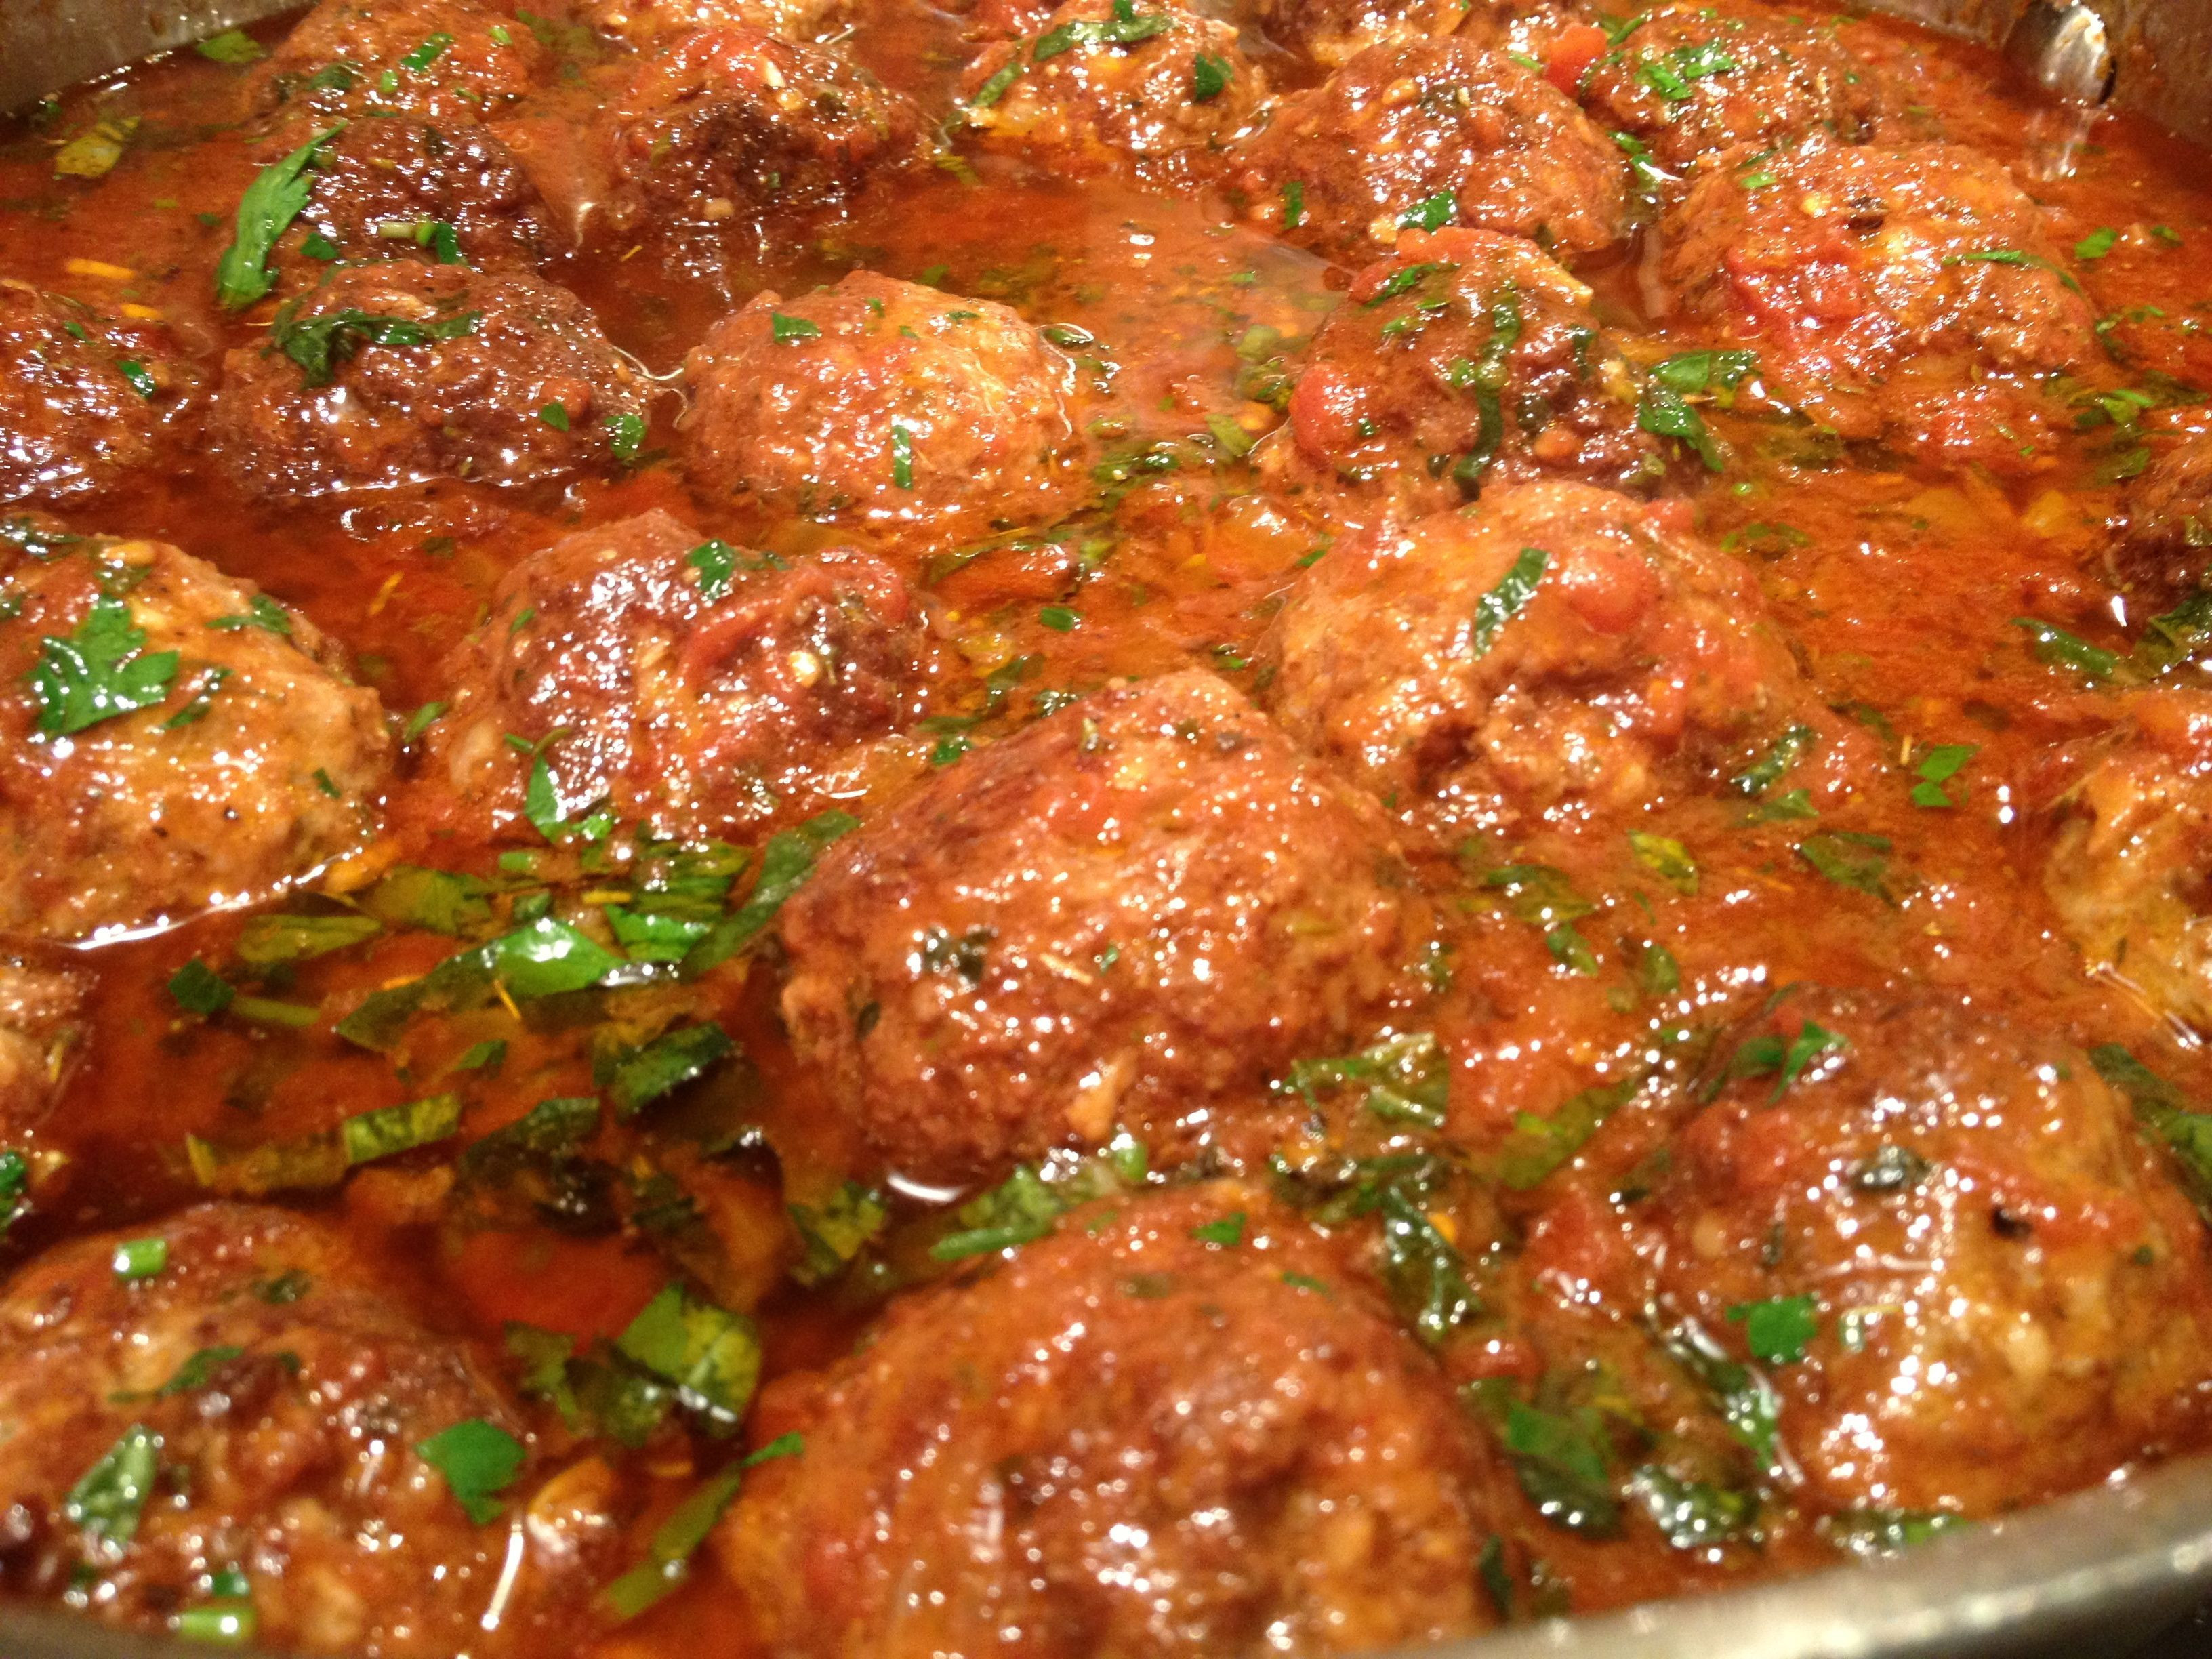 Italian Meatball Recipes  Homemade Italian Meatballs or Meatball sub but the